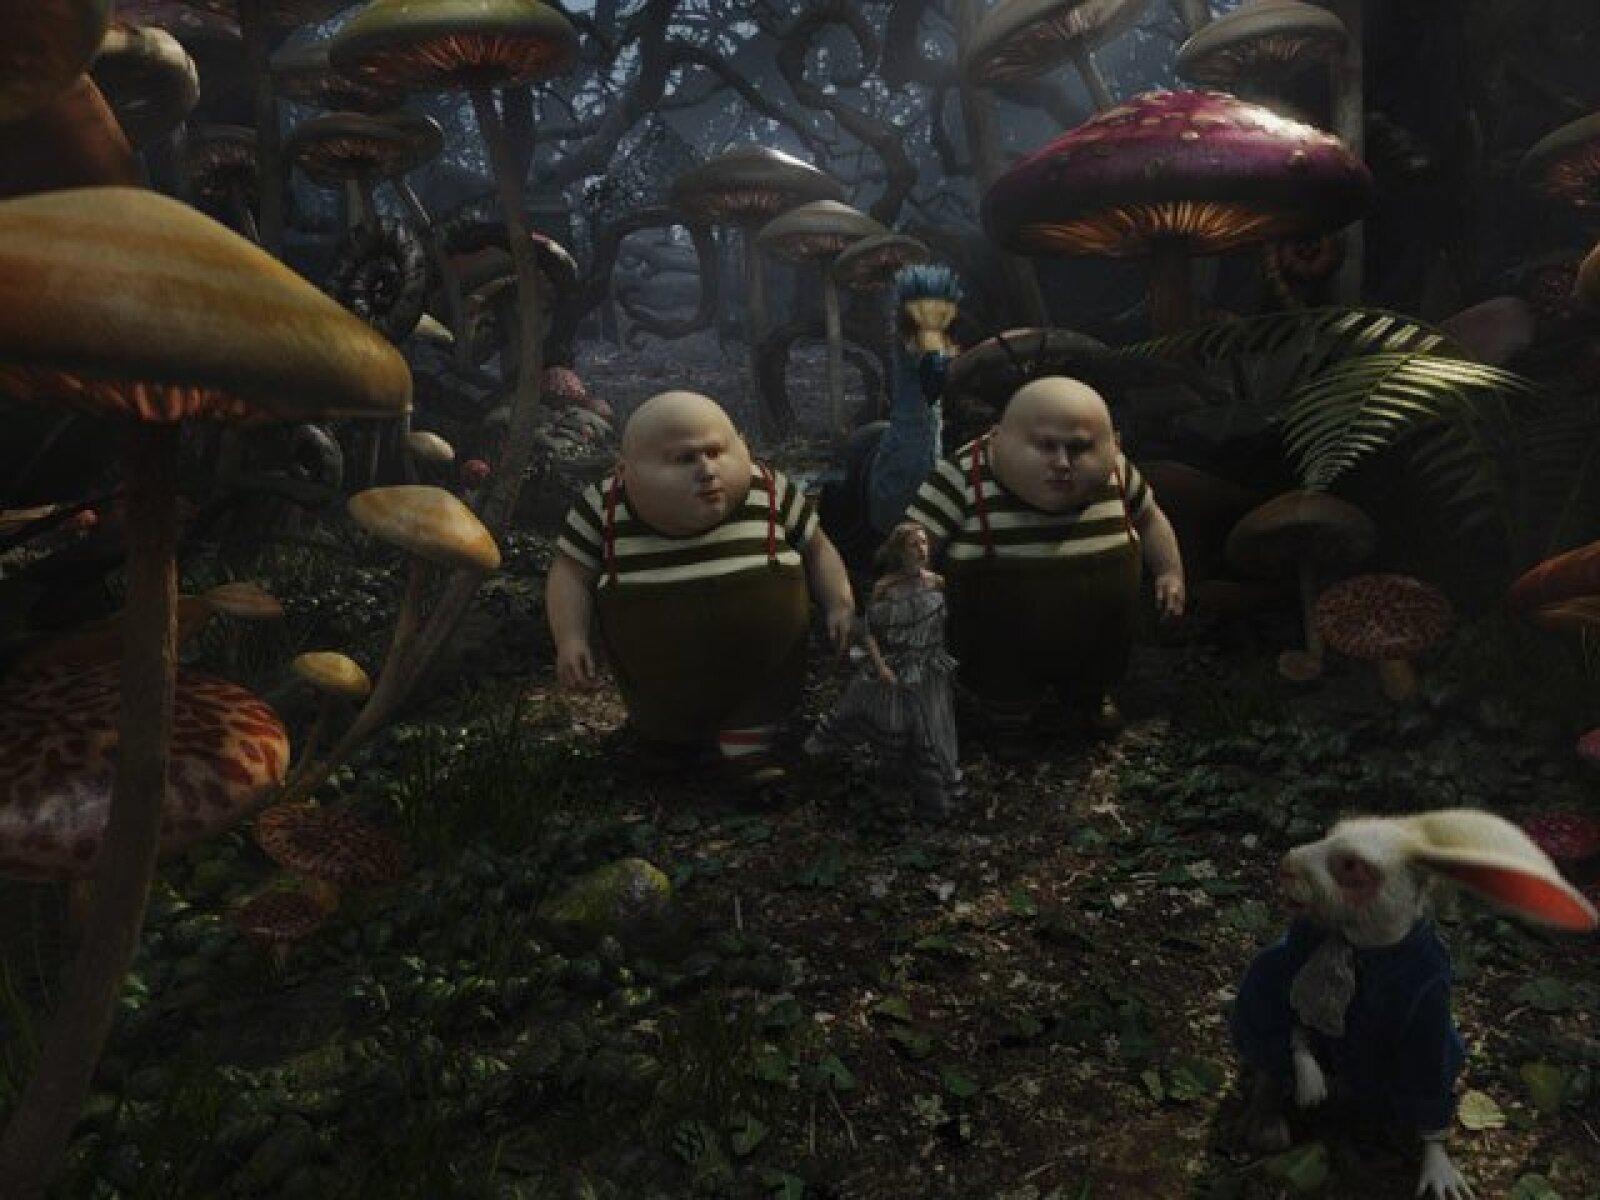 Tweedledee y Tweedledum son personajes clave en la cinta.